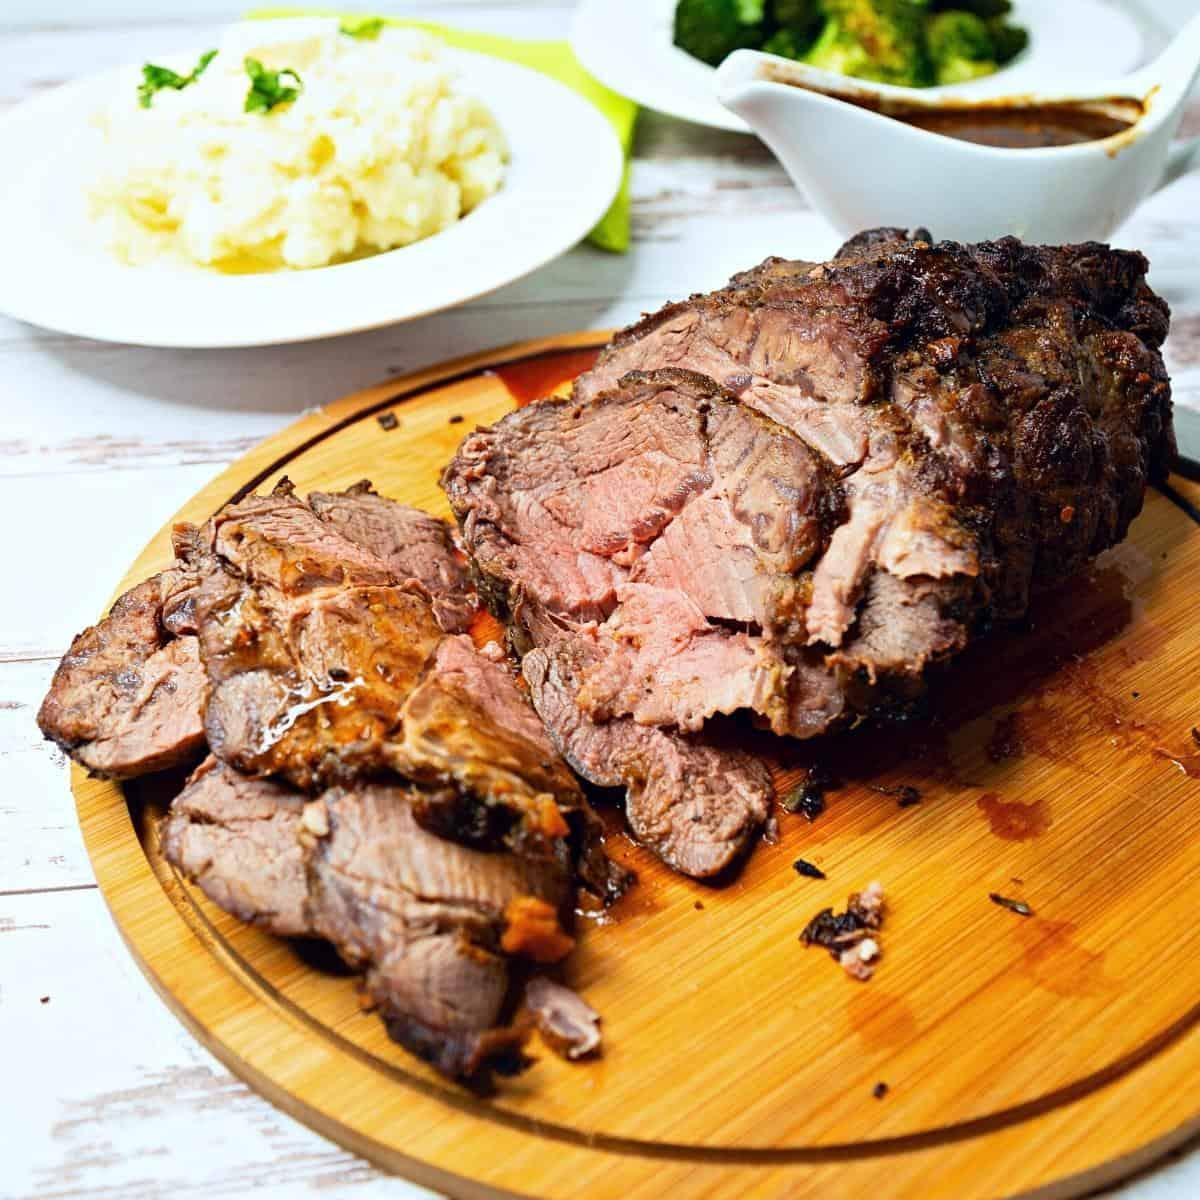 A sliced roast beef on a wooden board.